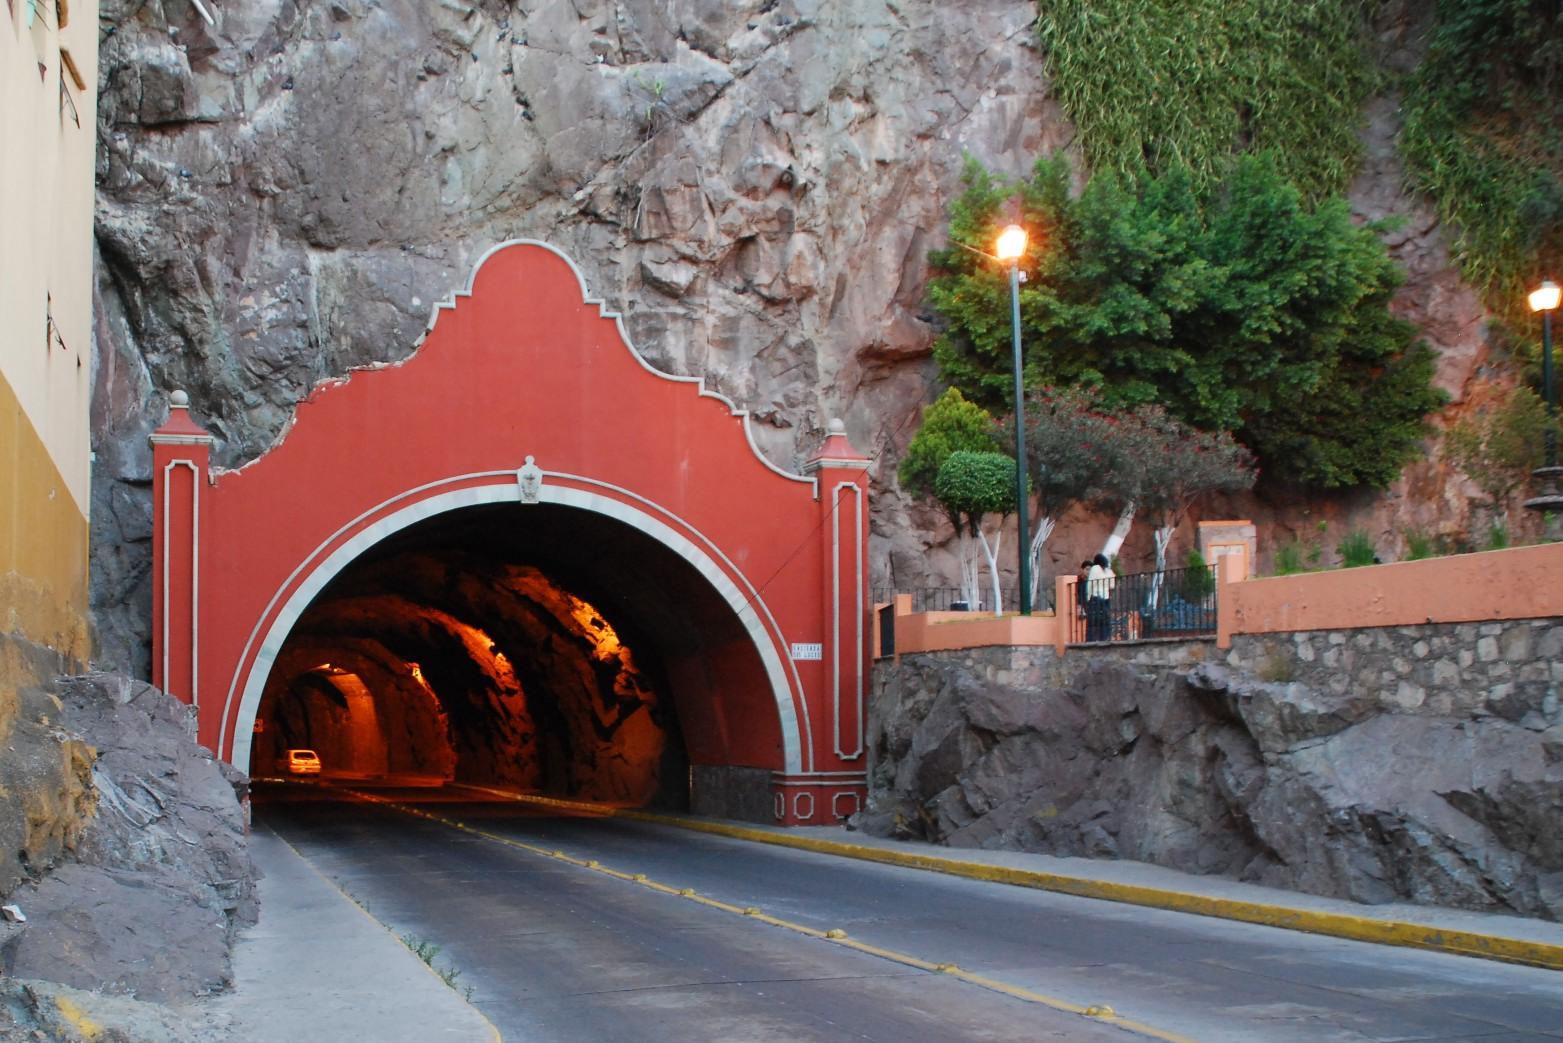 Tunnel - Wikipedia  Tunnel - Wikipe...